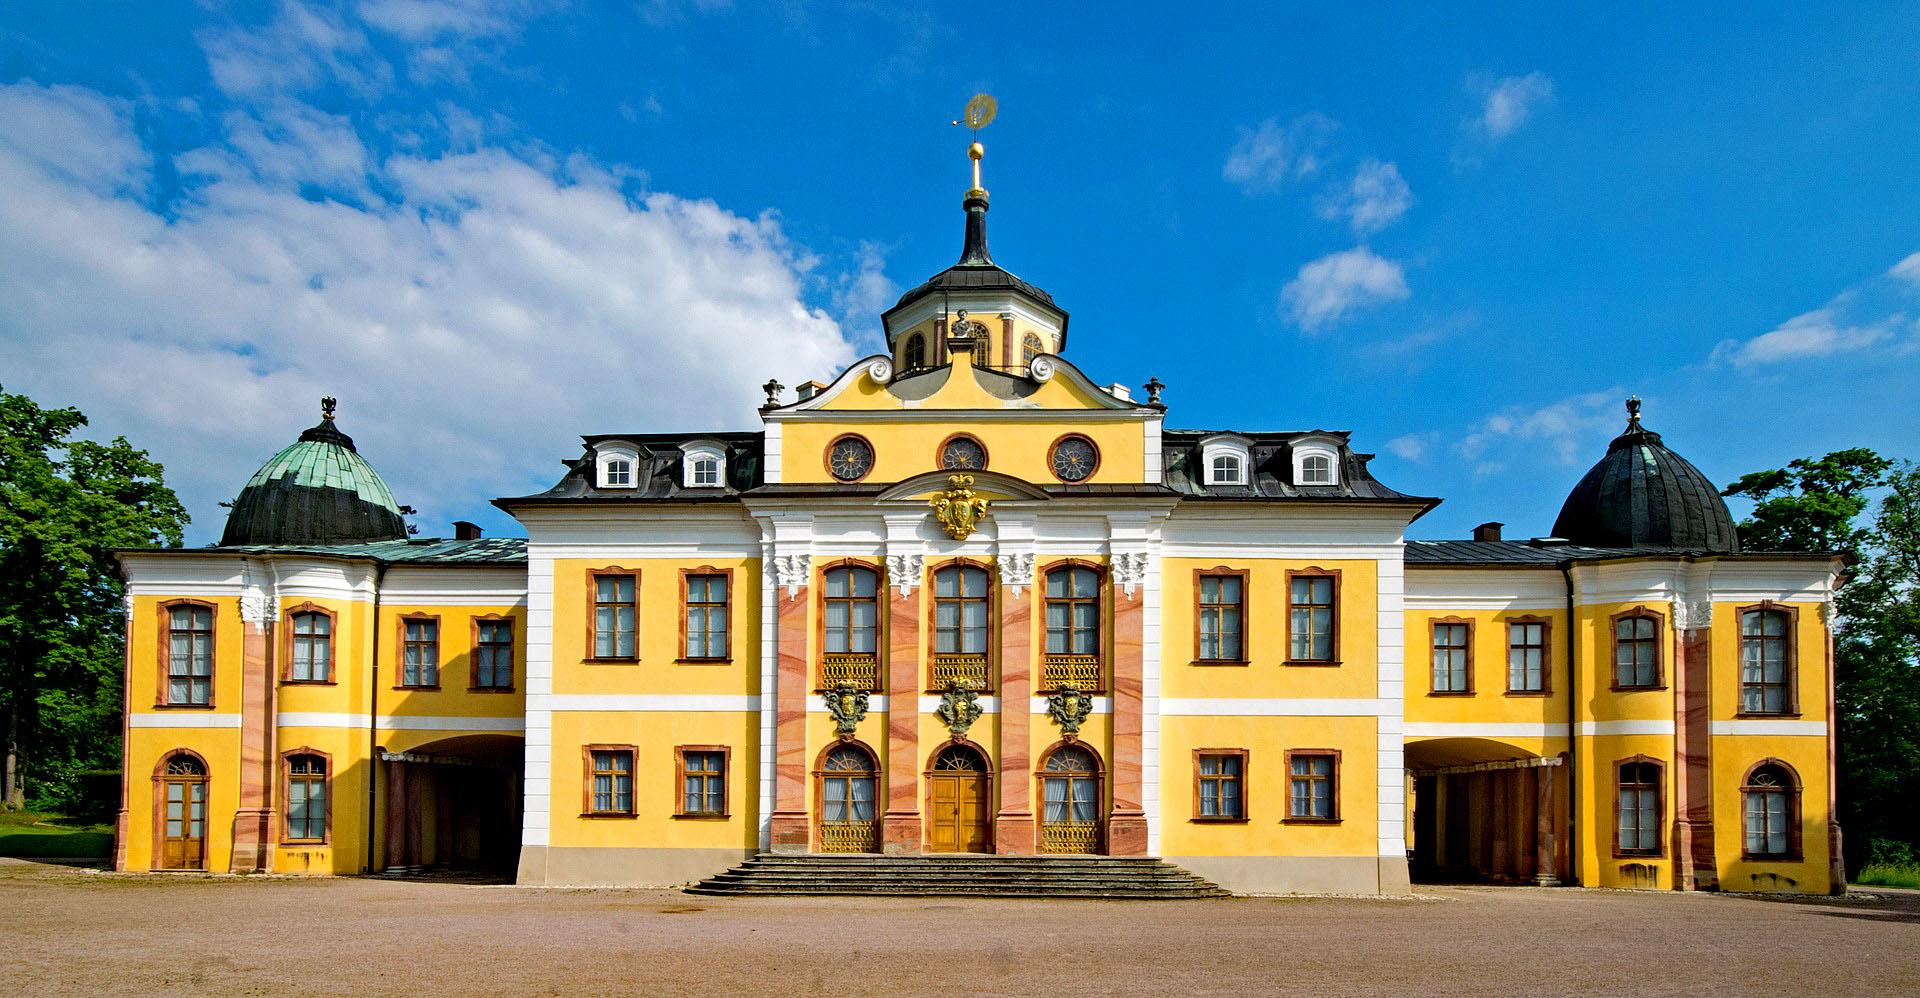 Schloss Belvedere, Leipzig